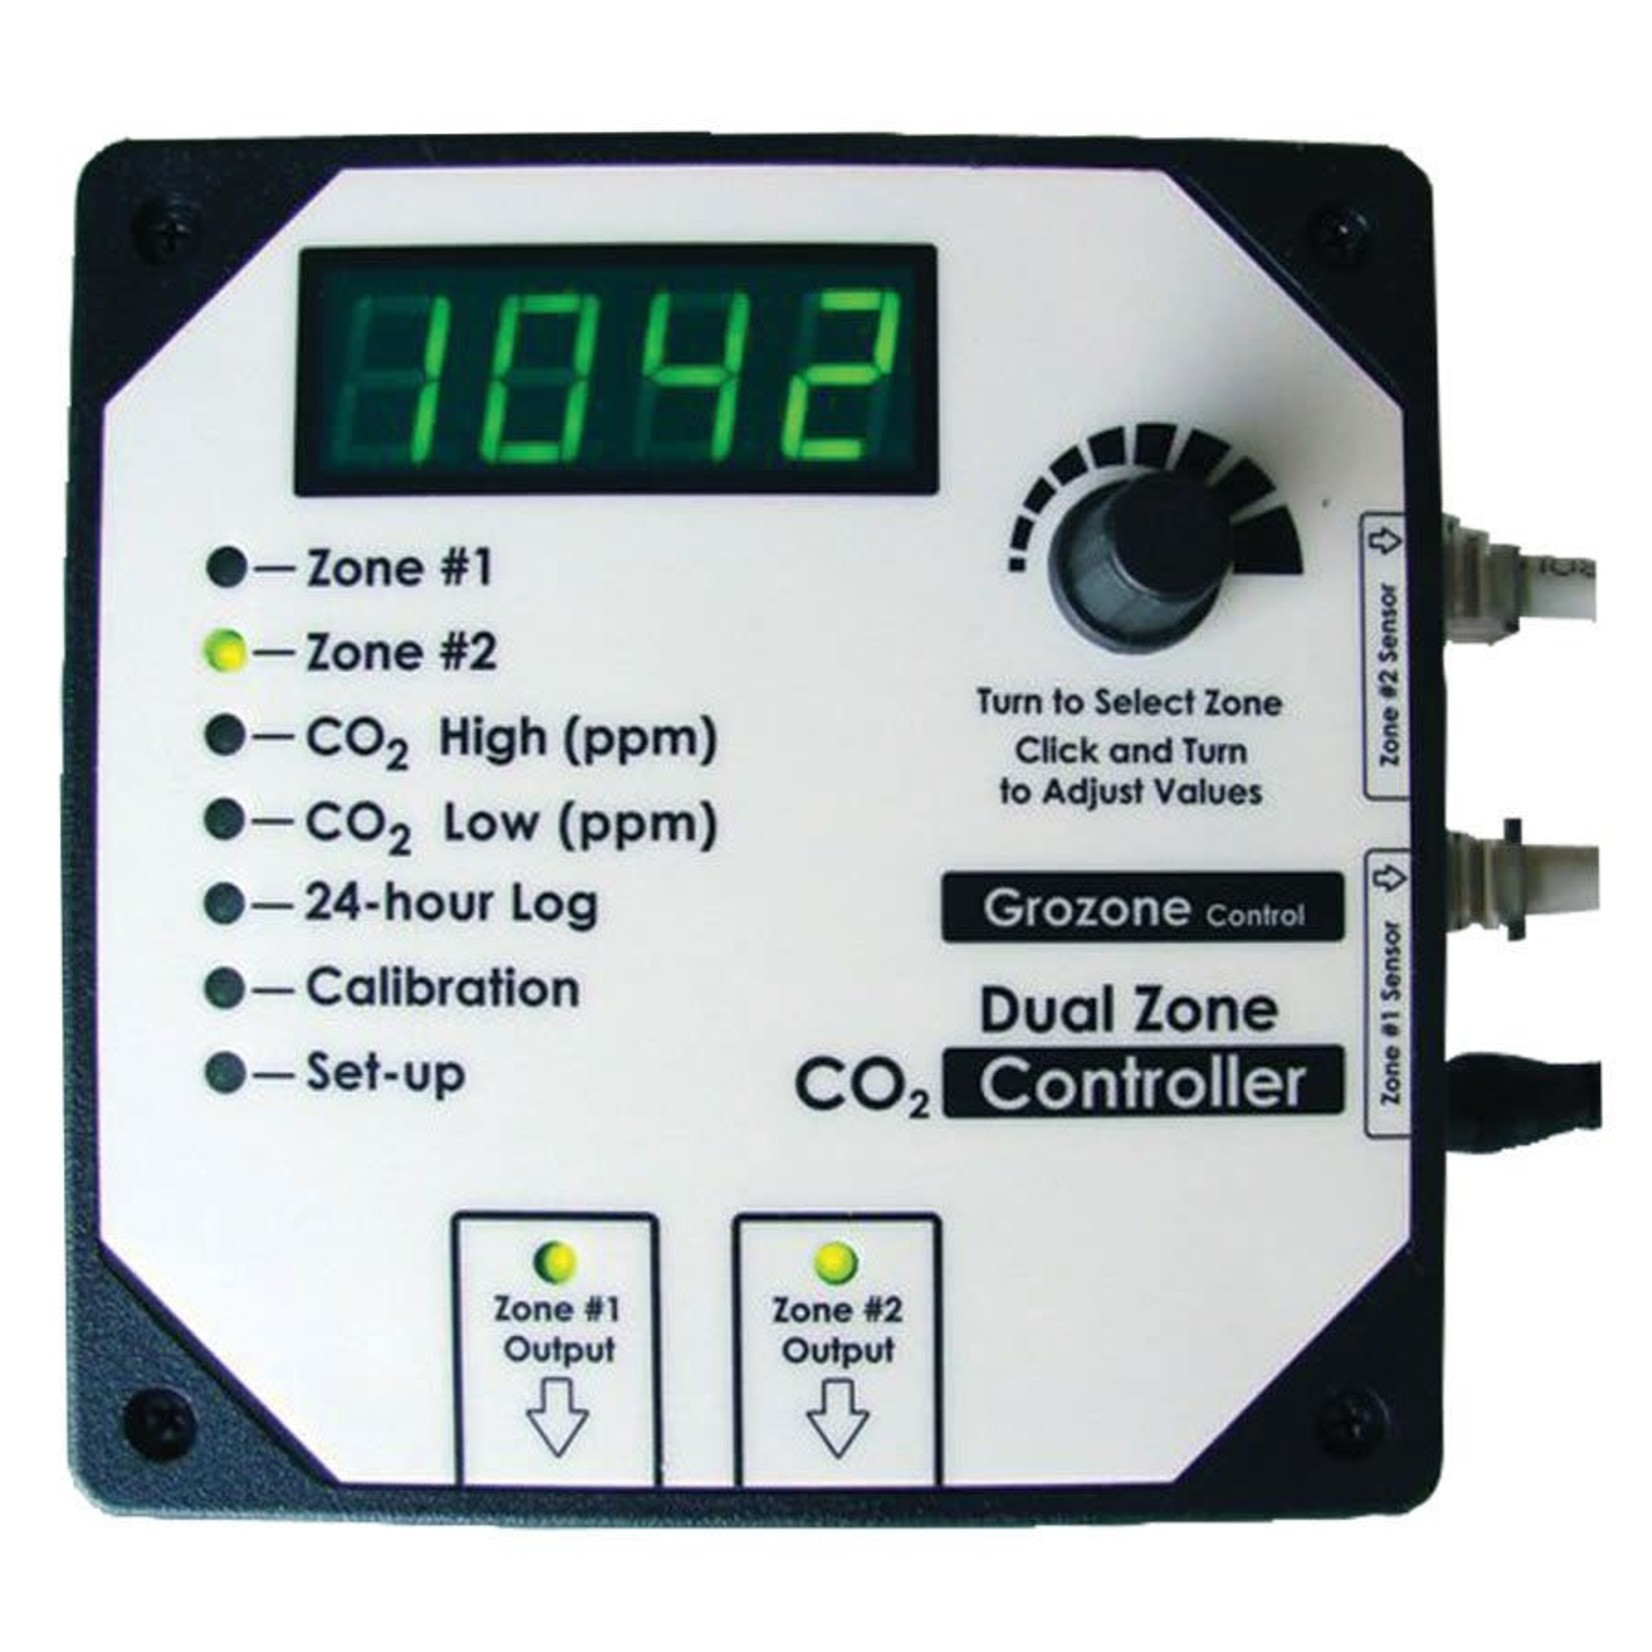 Grozone Controls GROZONE CO2D DUAL ZONE CO2 CONTROLLER 0-5000 PPM